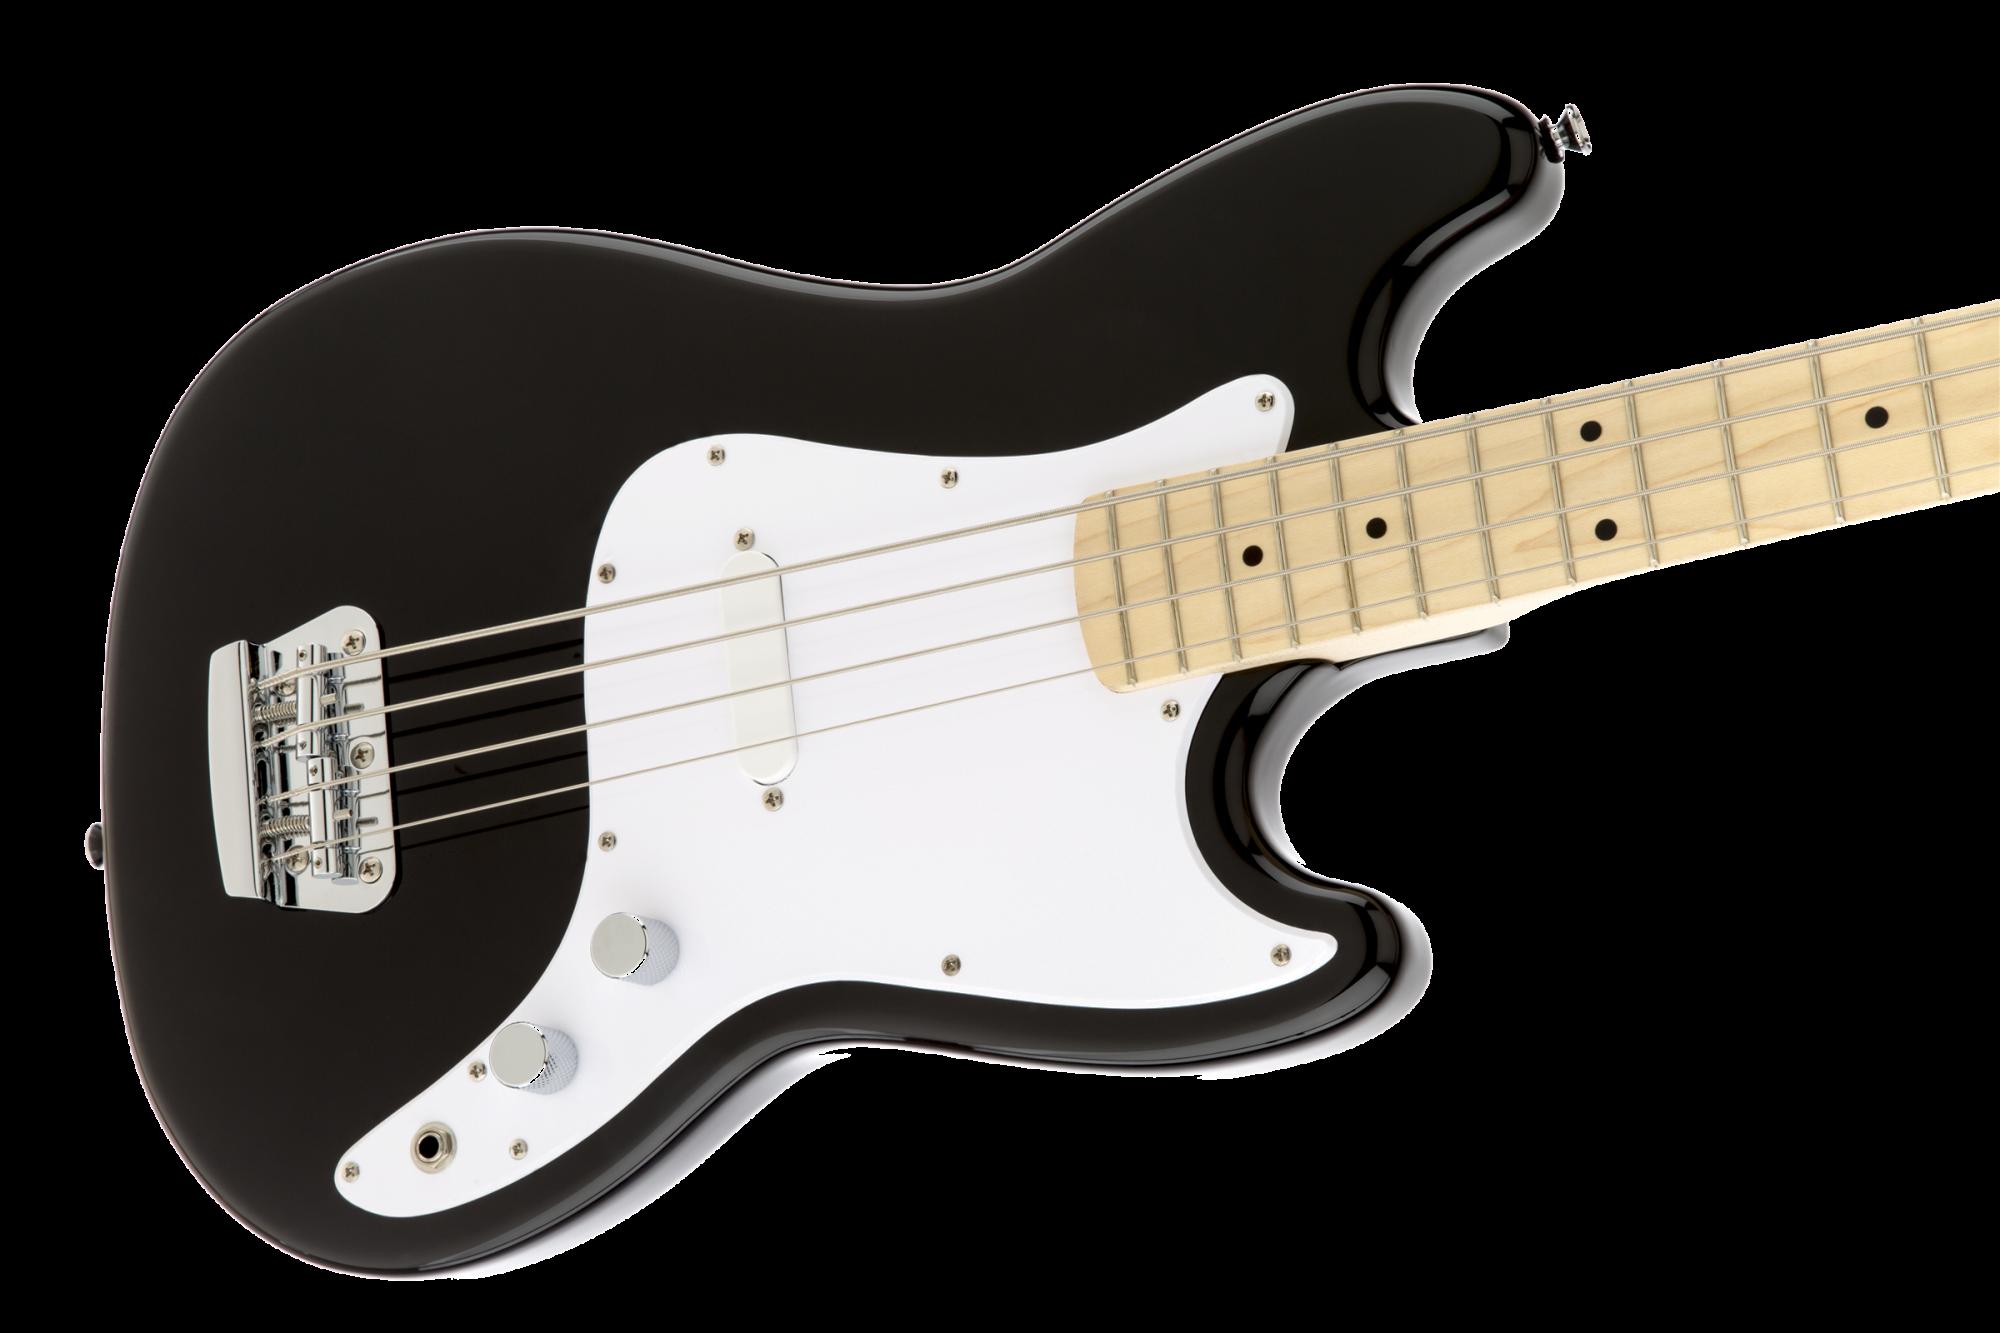 Squier Bronco Bass - Black